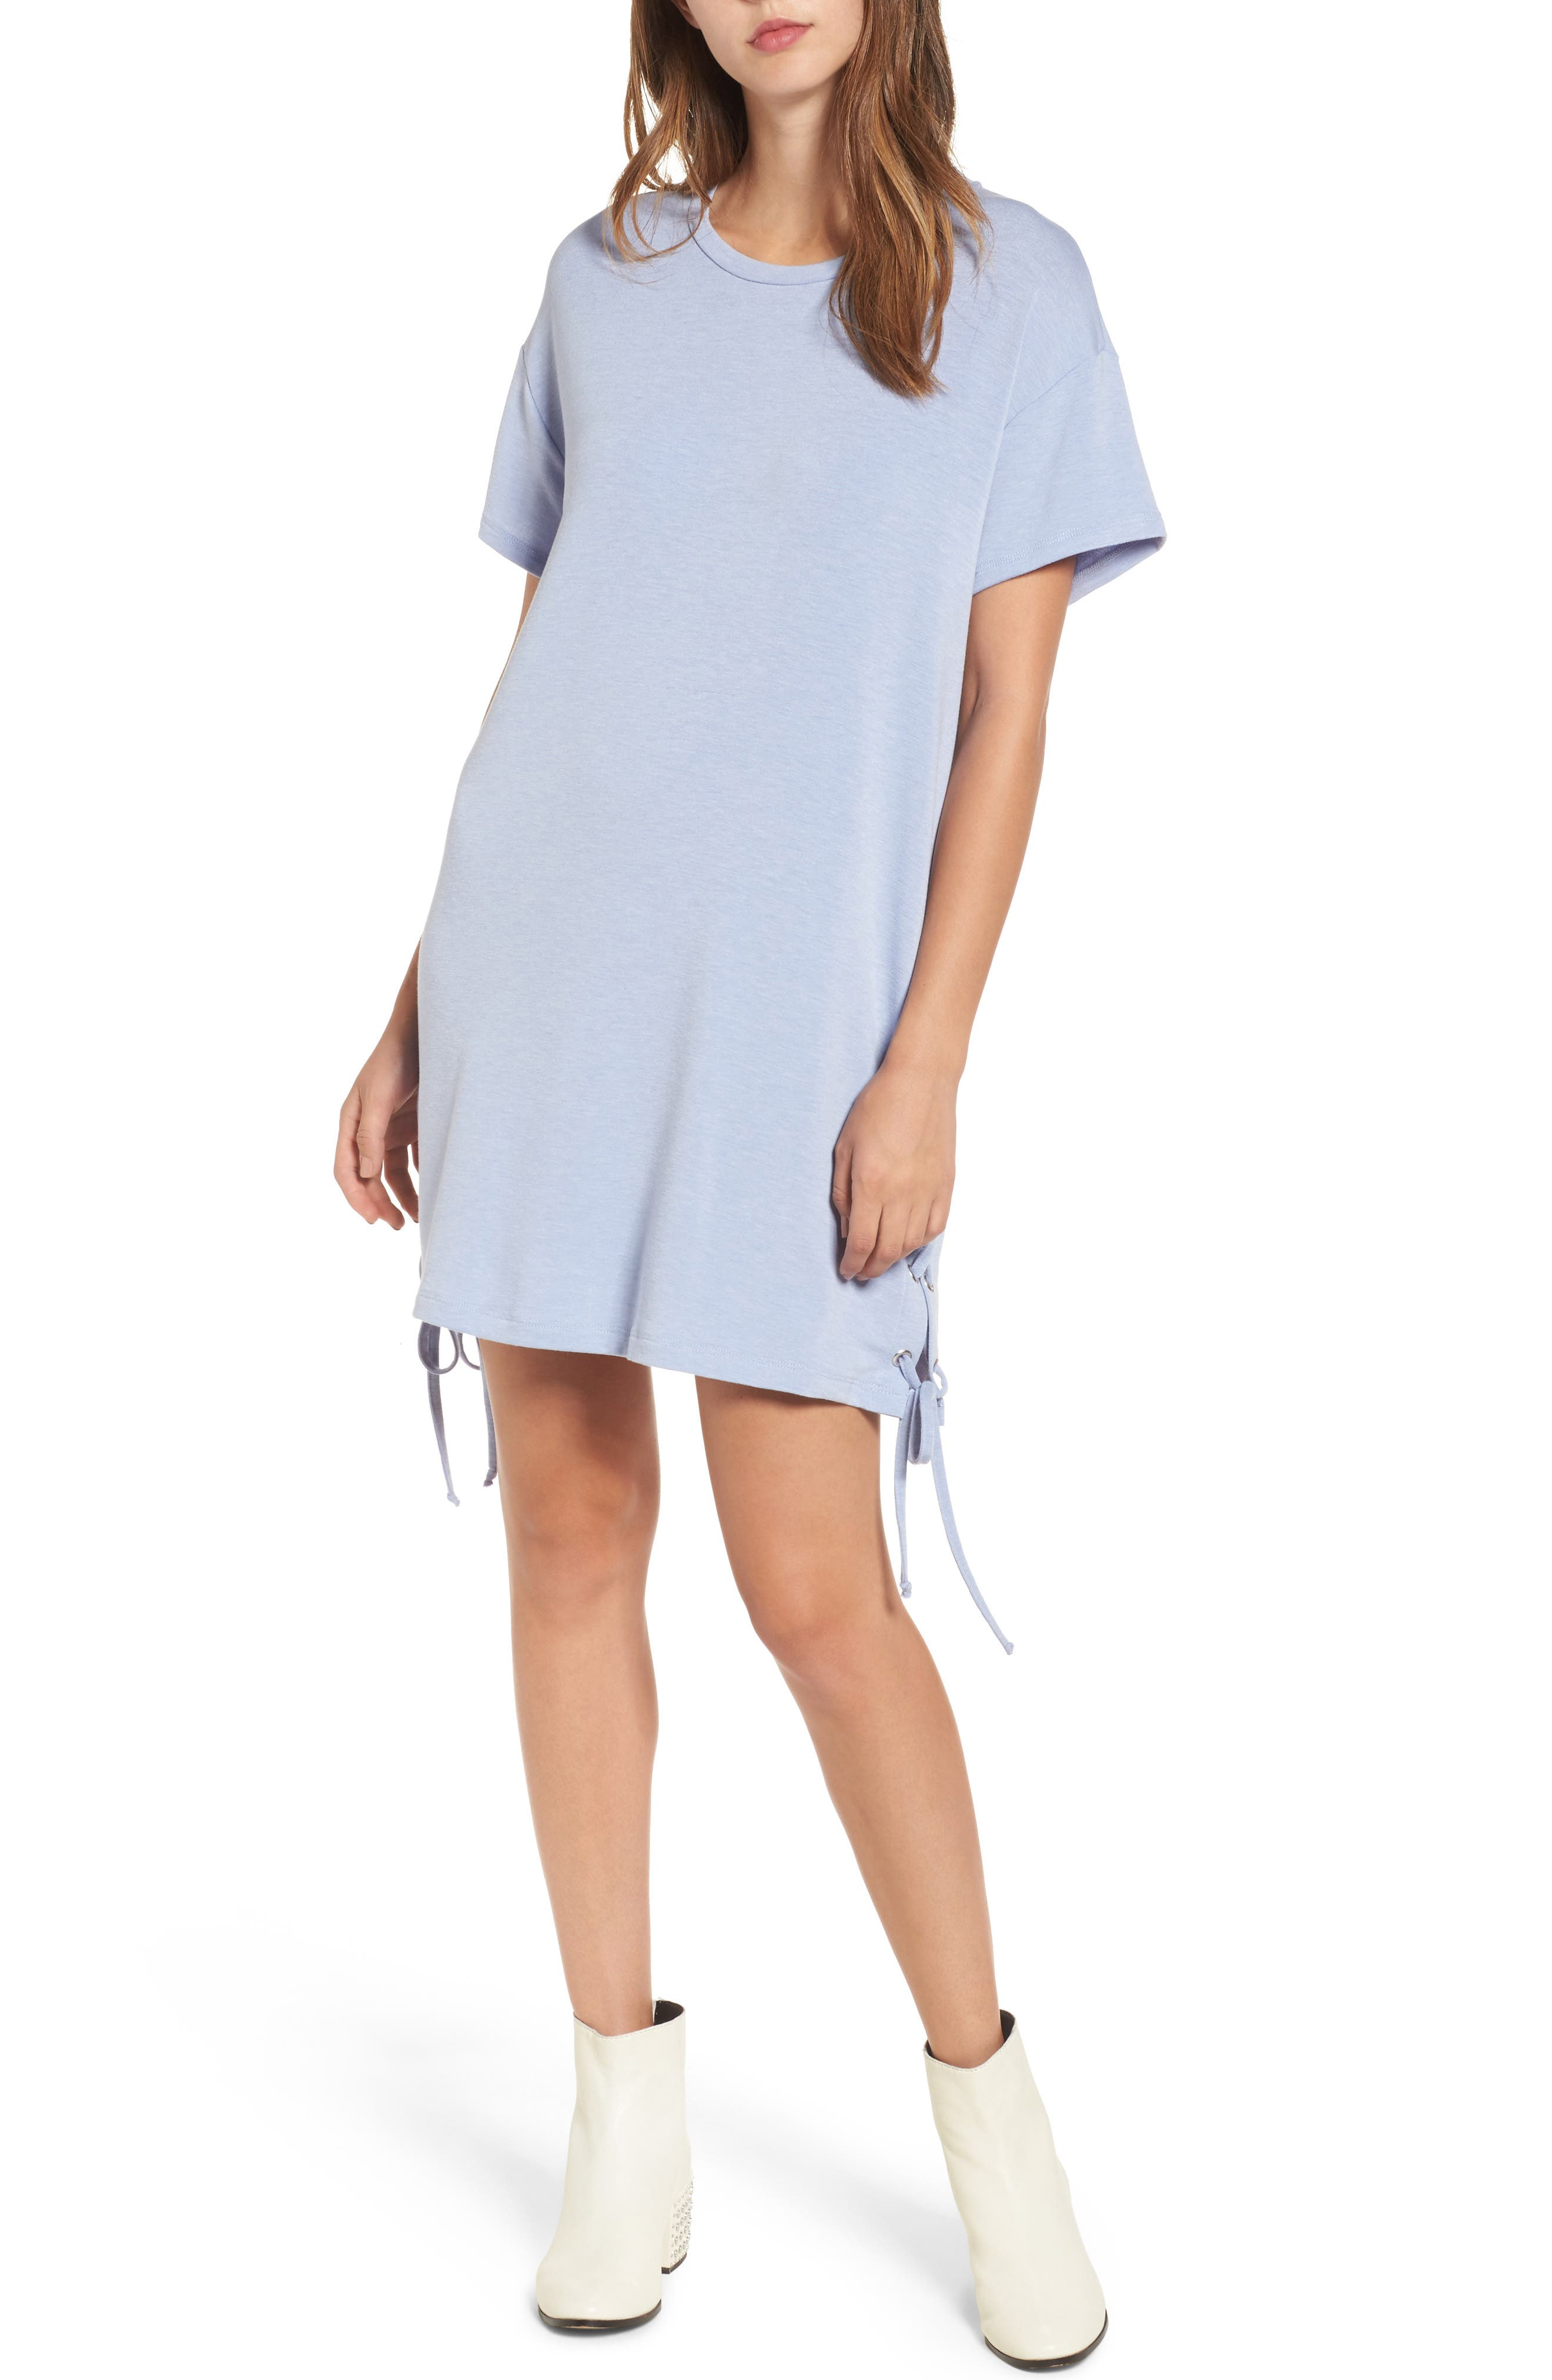 Main Image - Lace-Up Side T-Shirt Dress